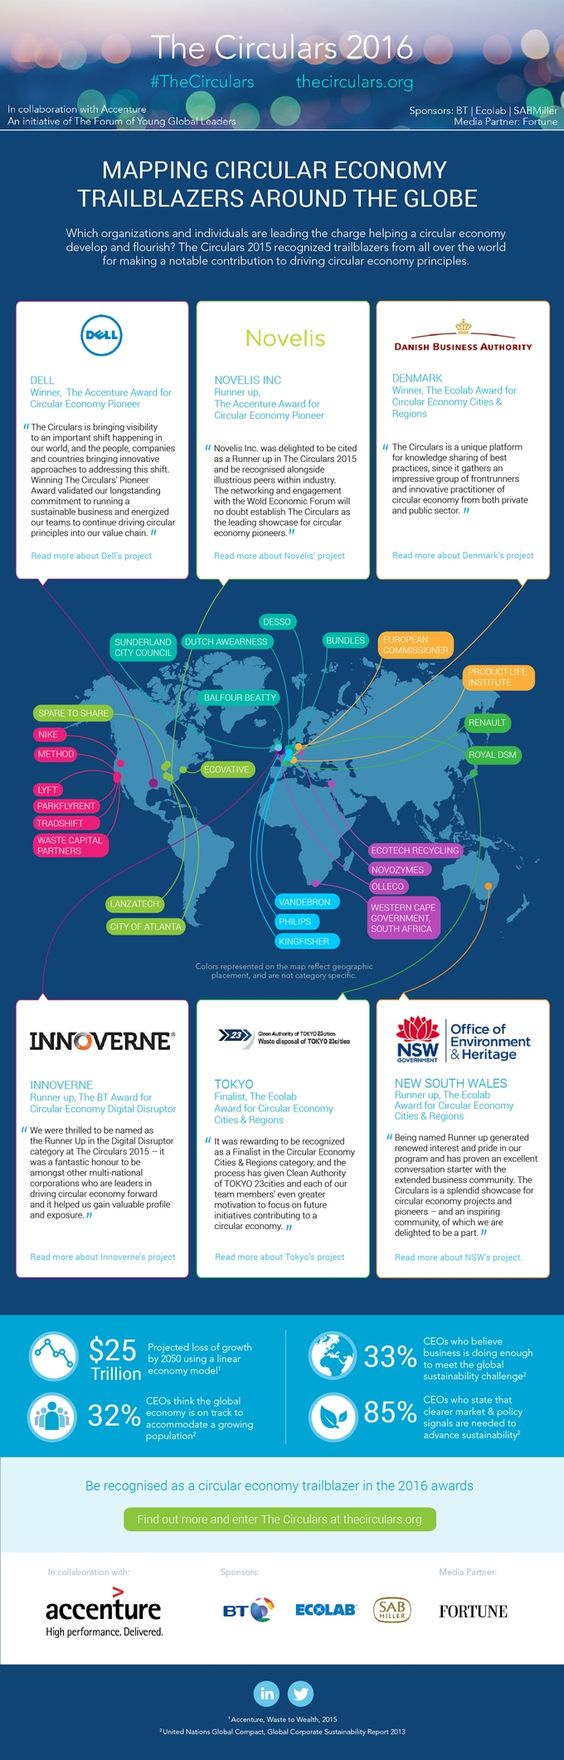 [Infographic] Mapping Circular Economy Trailblazers Around the World